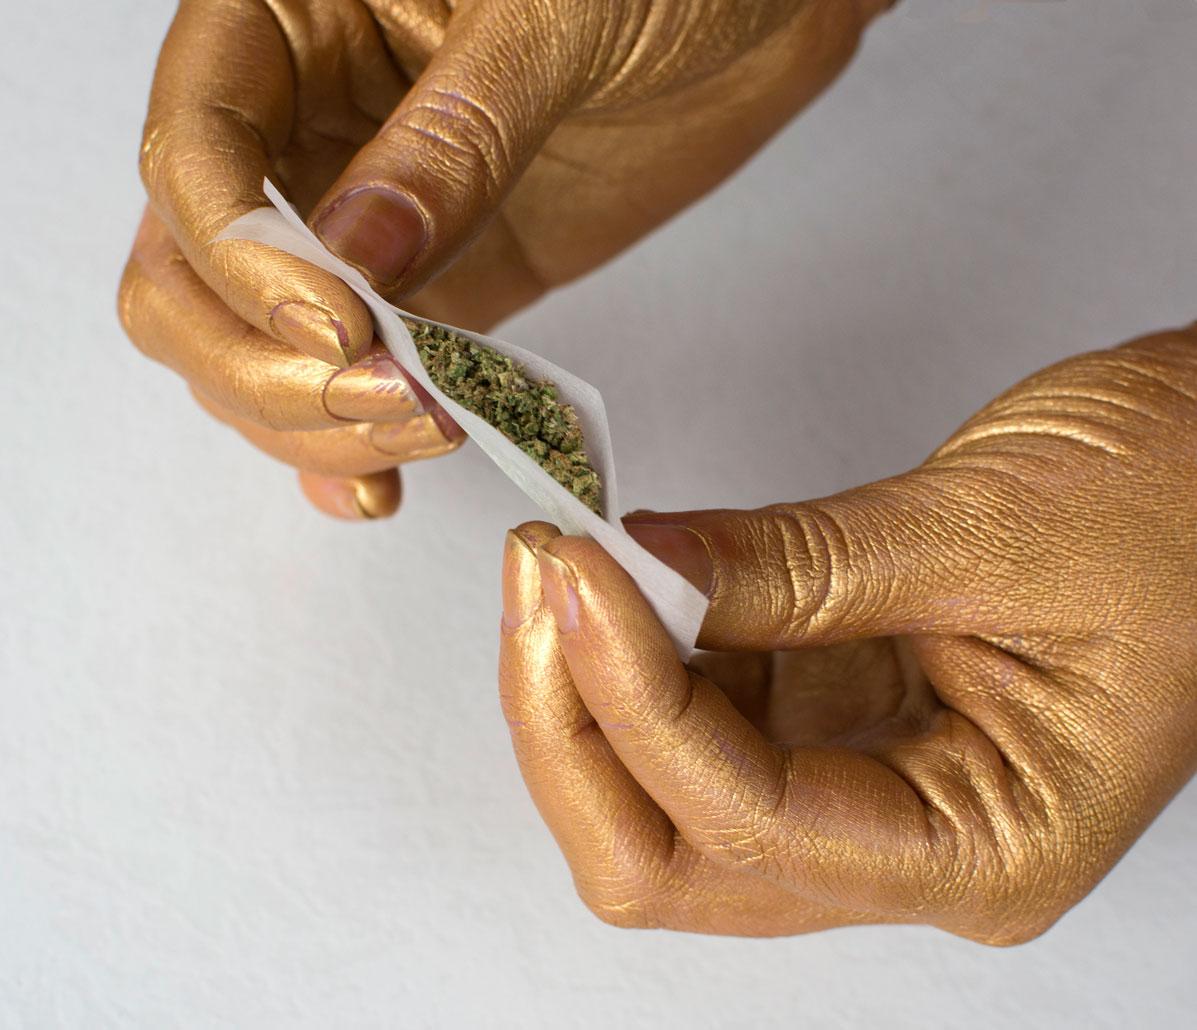 joint-gold-hands-angle-greenandgold.jpg